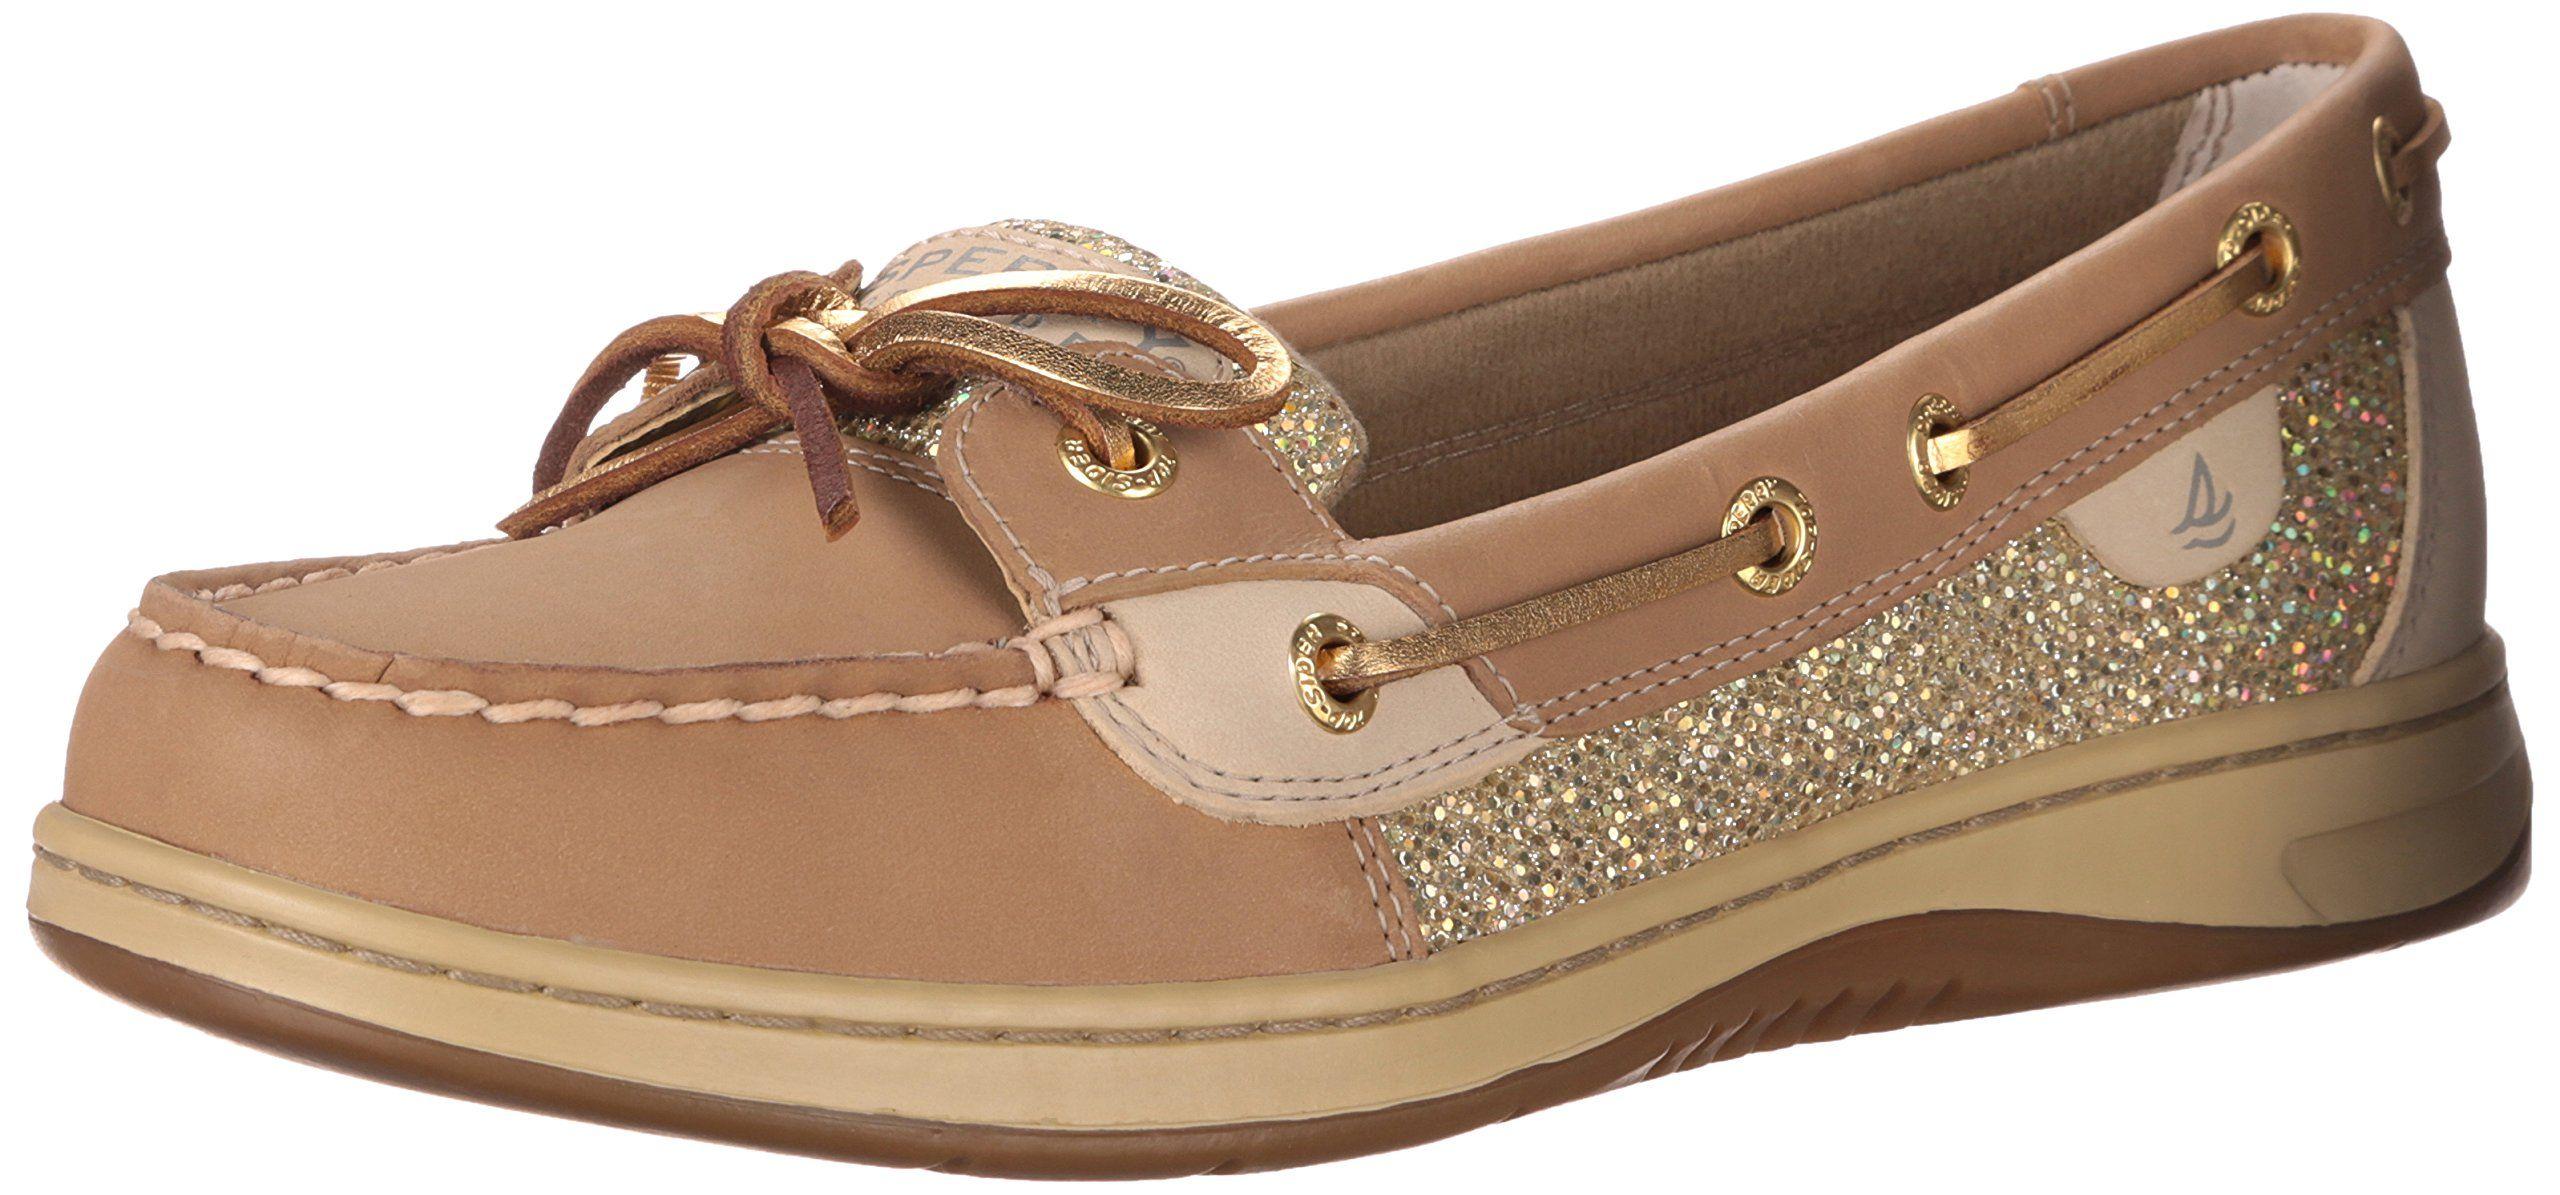 Sperry Top Sider Women S Angelfish Linen Glitter Boat Shoe 8